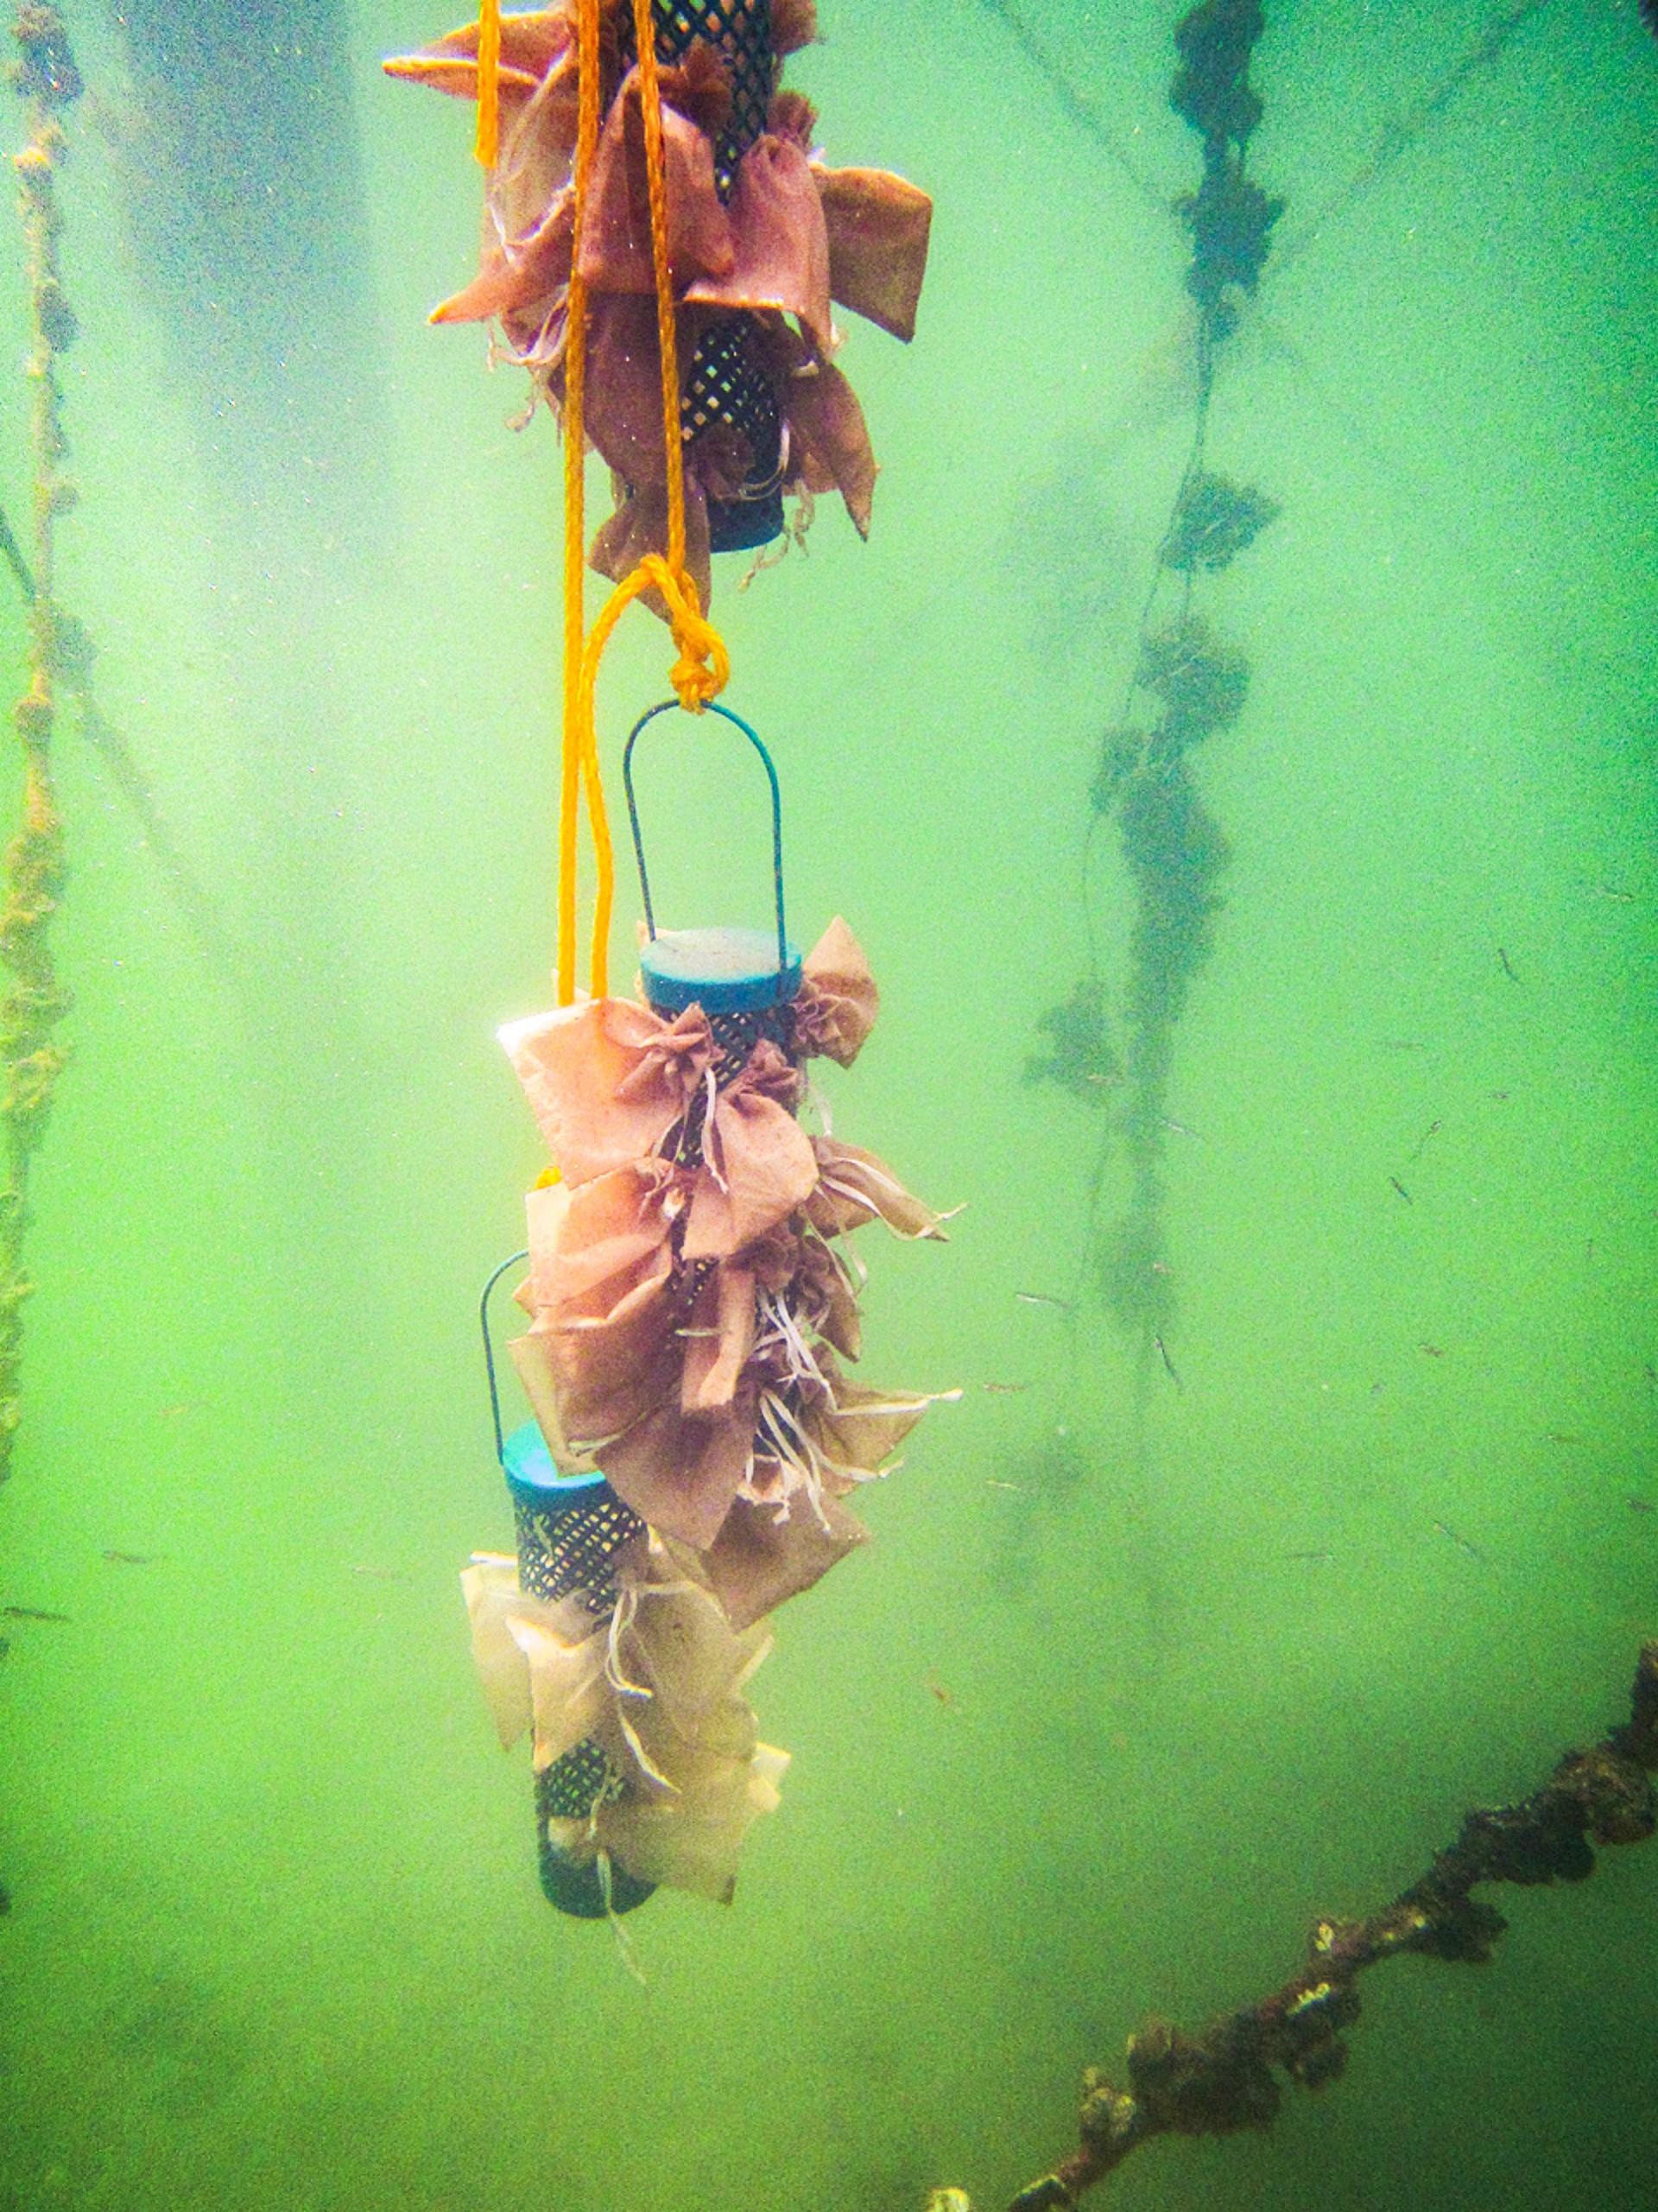 Swimming on microplastics